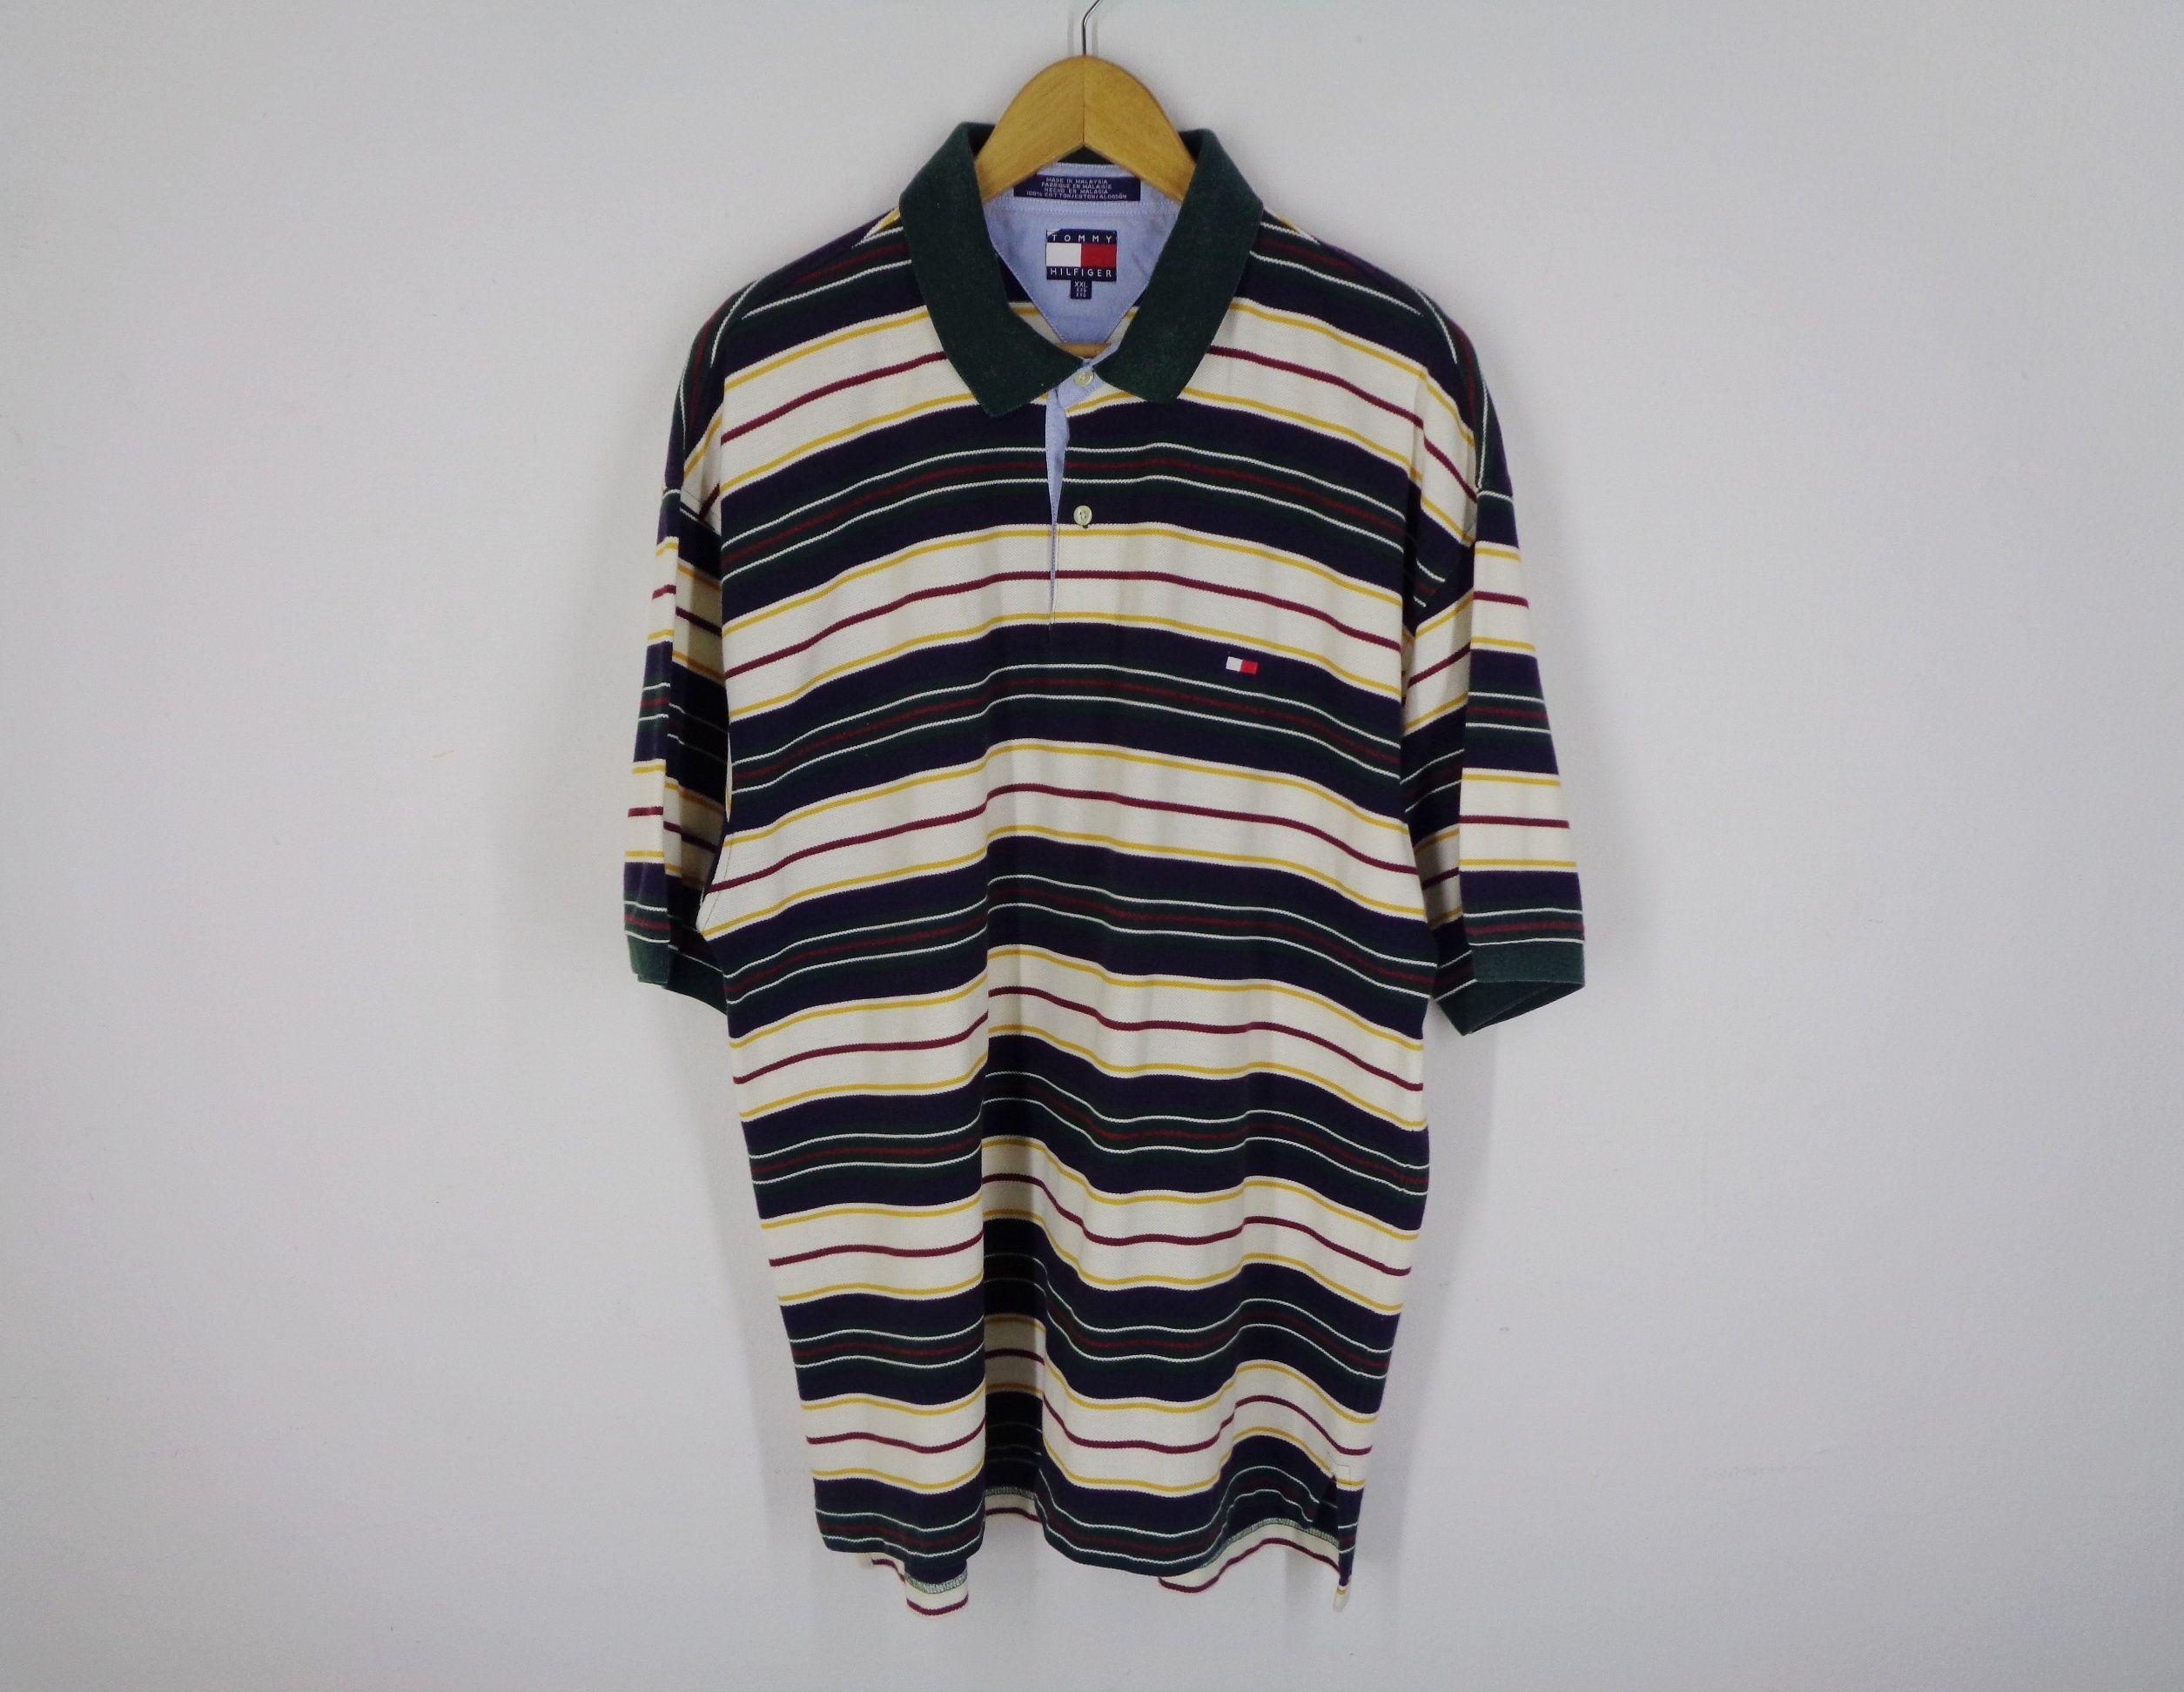 Tommy Hilfiger Shirt Vintage Tommy Hilfiger Polo Shirt